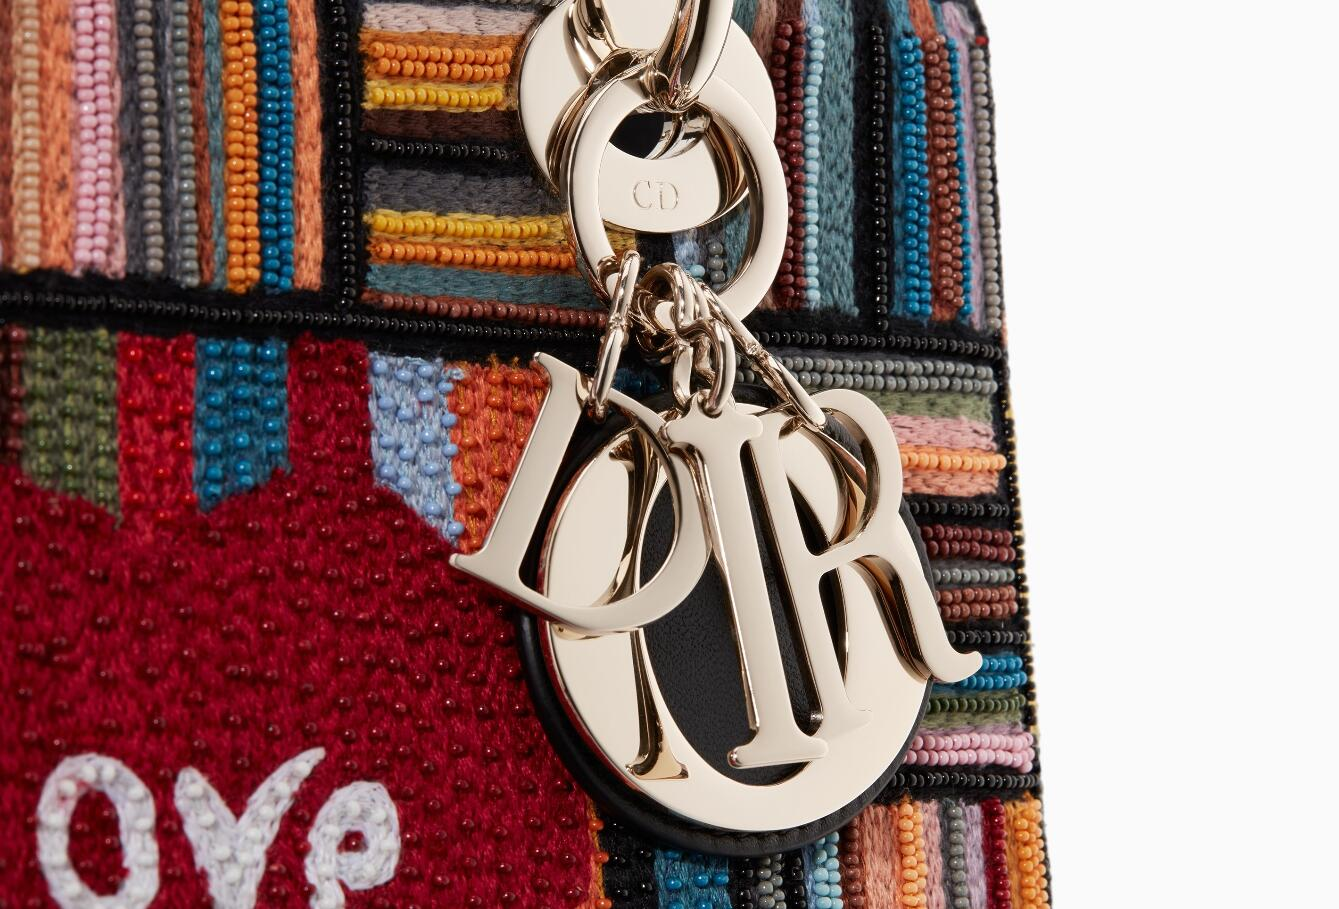 dior戴妃包 Lady Dior刺绣 丝线和珠绣 手提包 缀Dioramour心形图案